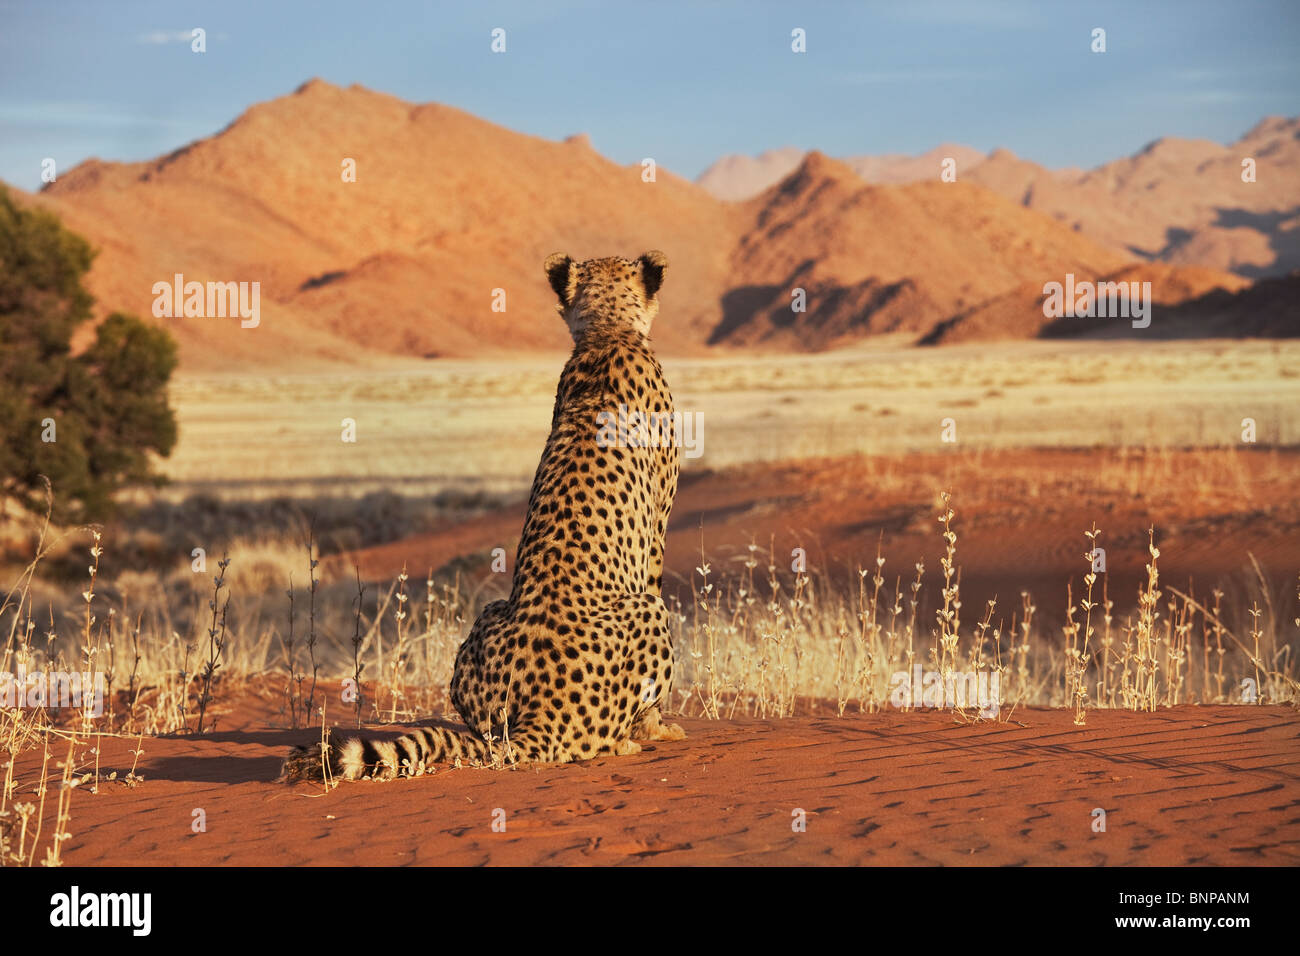 Cheetah (Acinonyx jubatus) with desert landscape in back ground. Namibia. - Stock Image